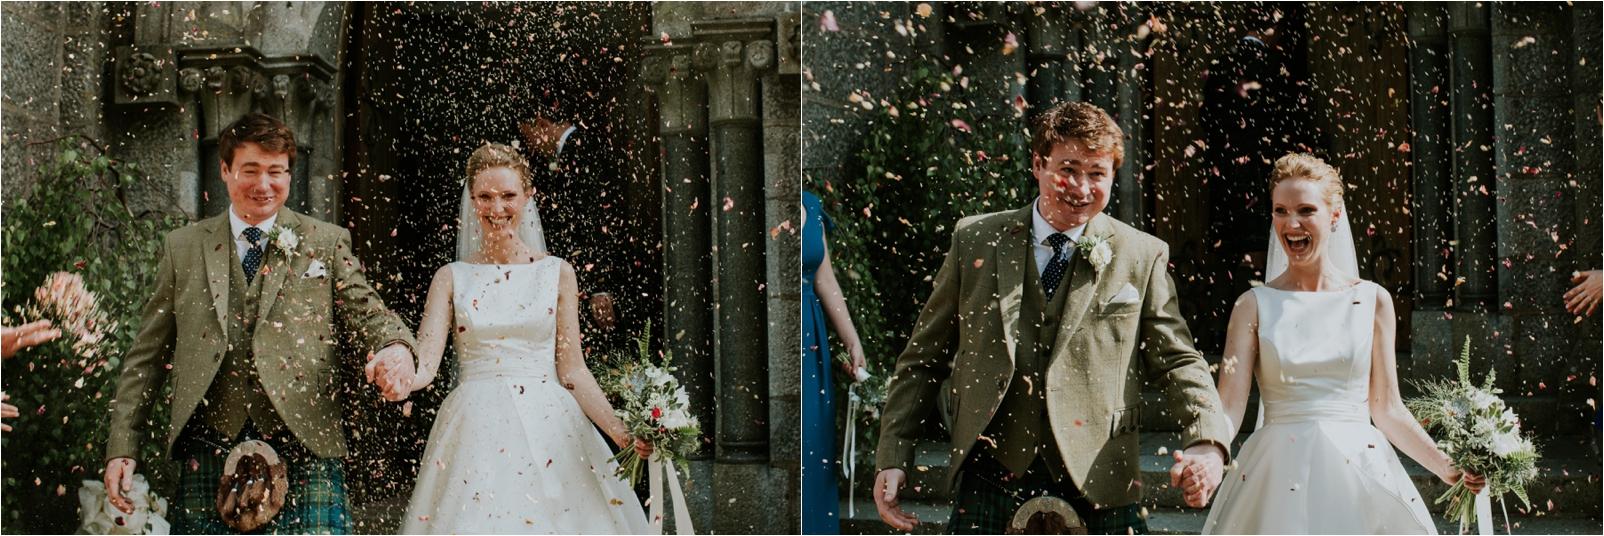 Photography 78 - Scottish Wedding Photographer - Araminta & Jamie_0052.jpg